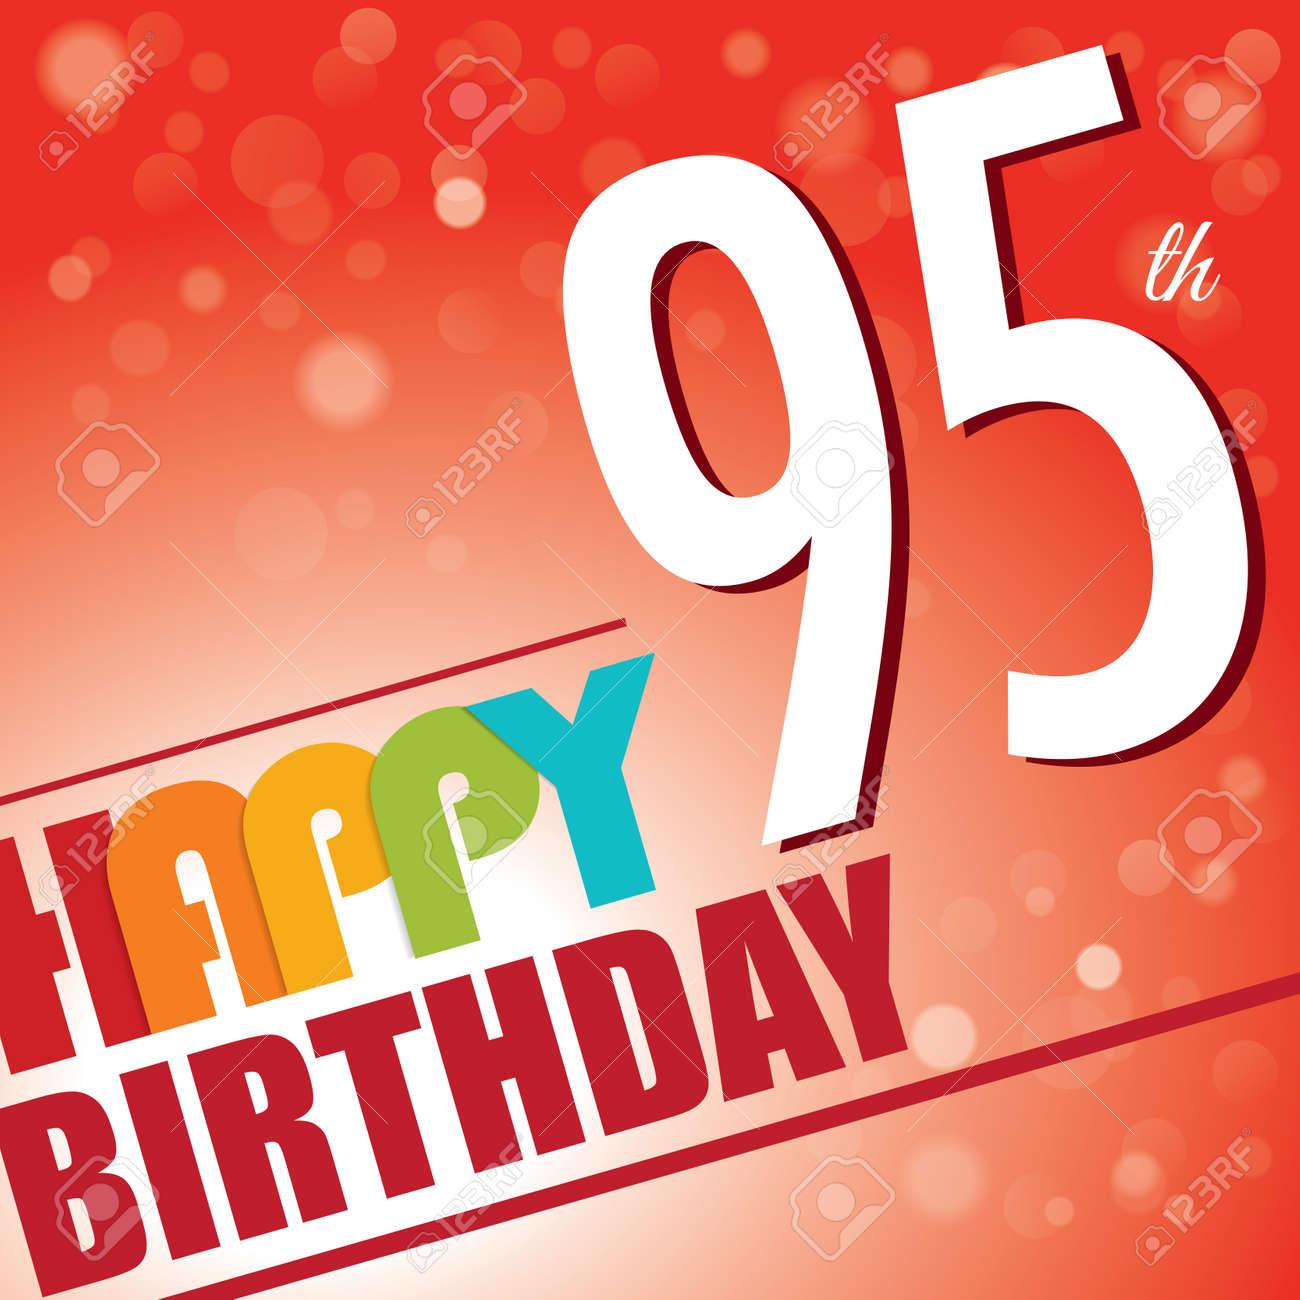 95th Birthday Party Invite Template Design In Bright And Colourful Retro Style